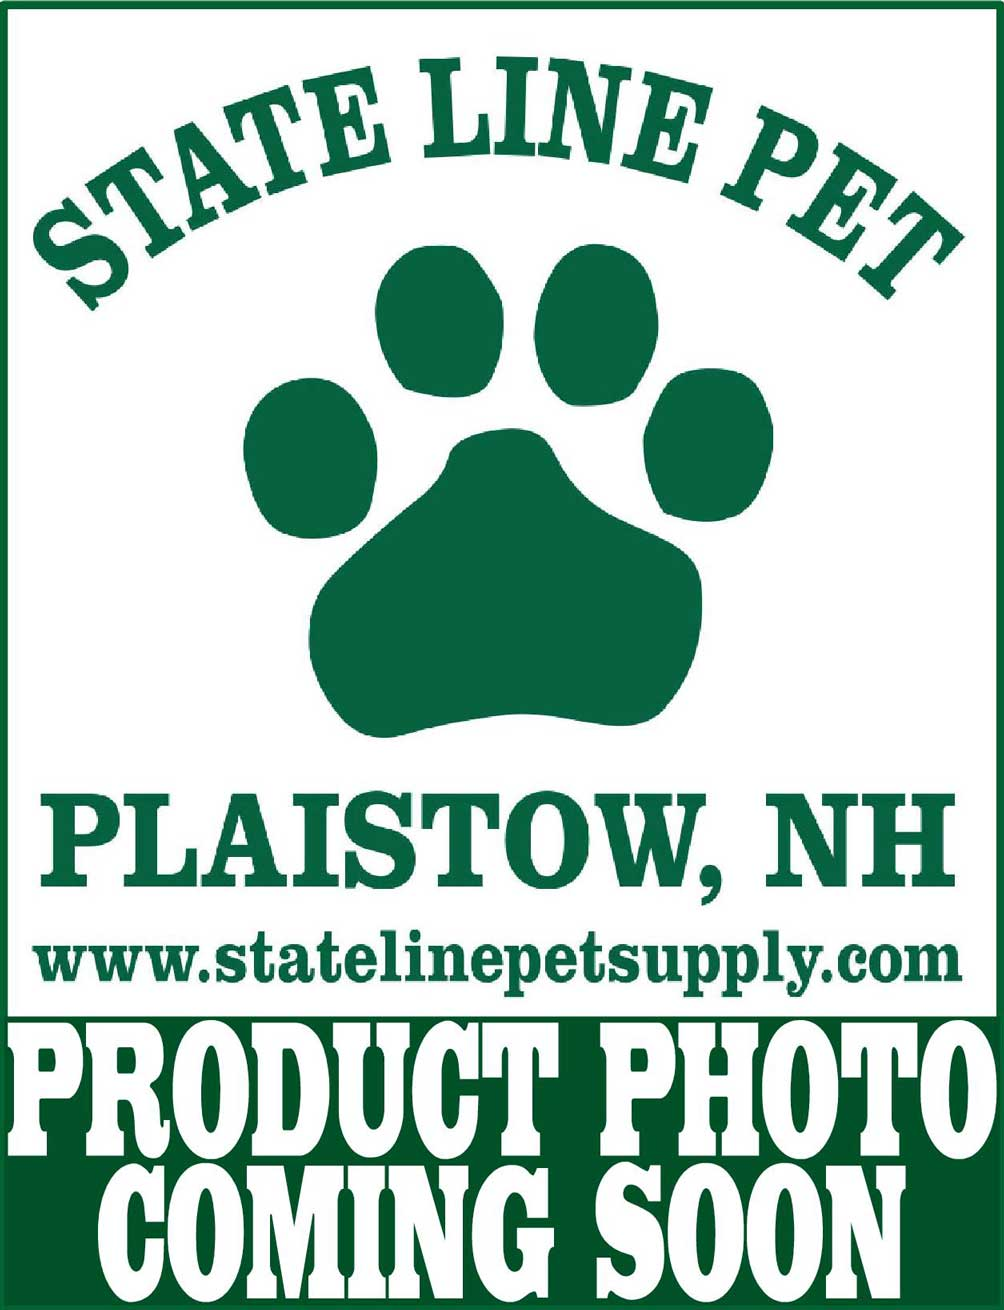 Cozy Paws Traction Dog Boot Large - Bone Apart Black & Grey